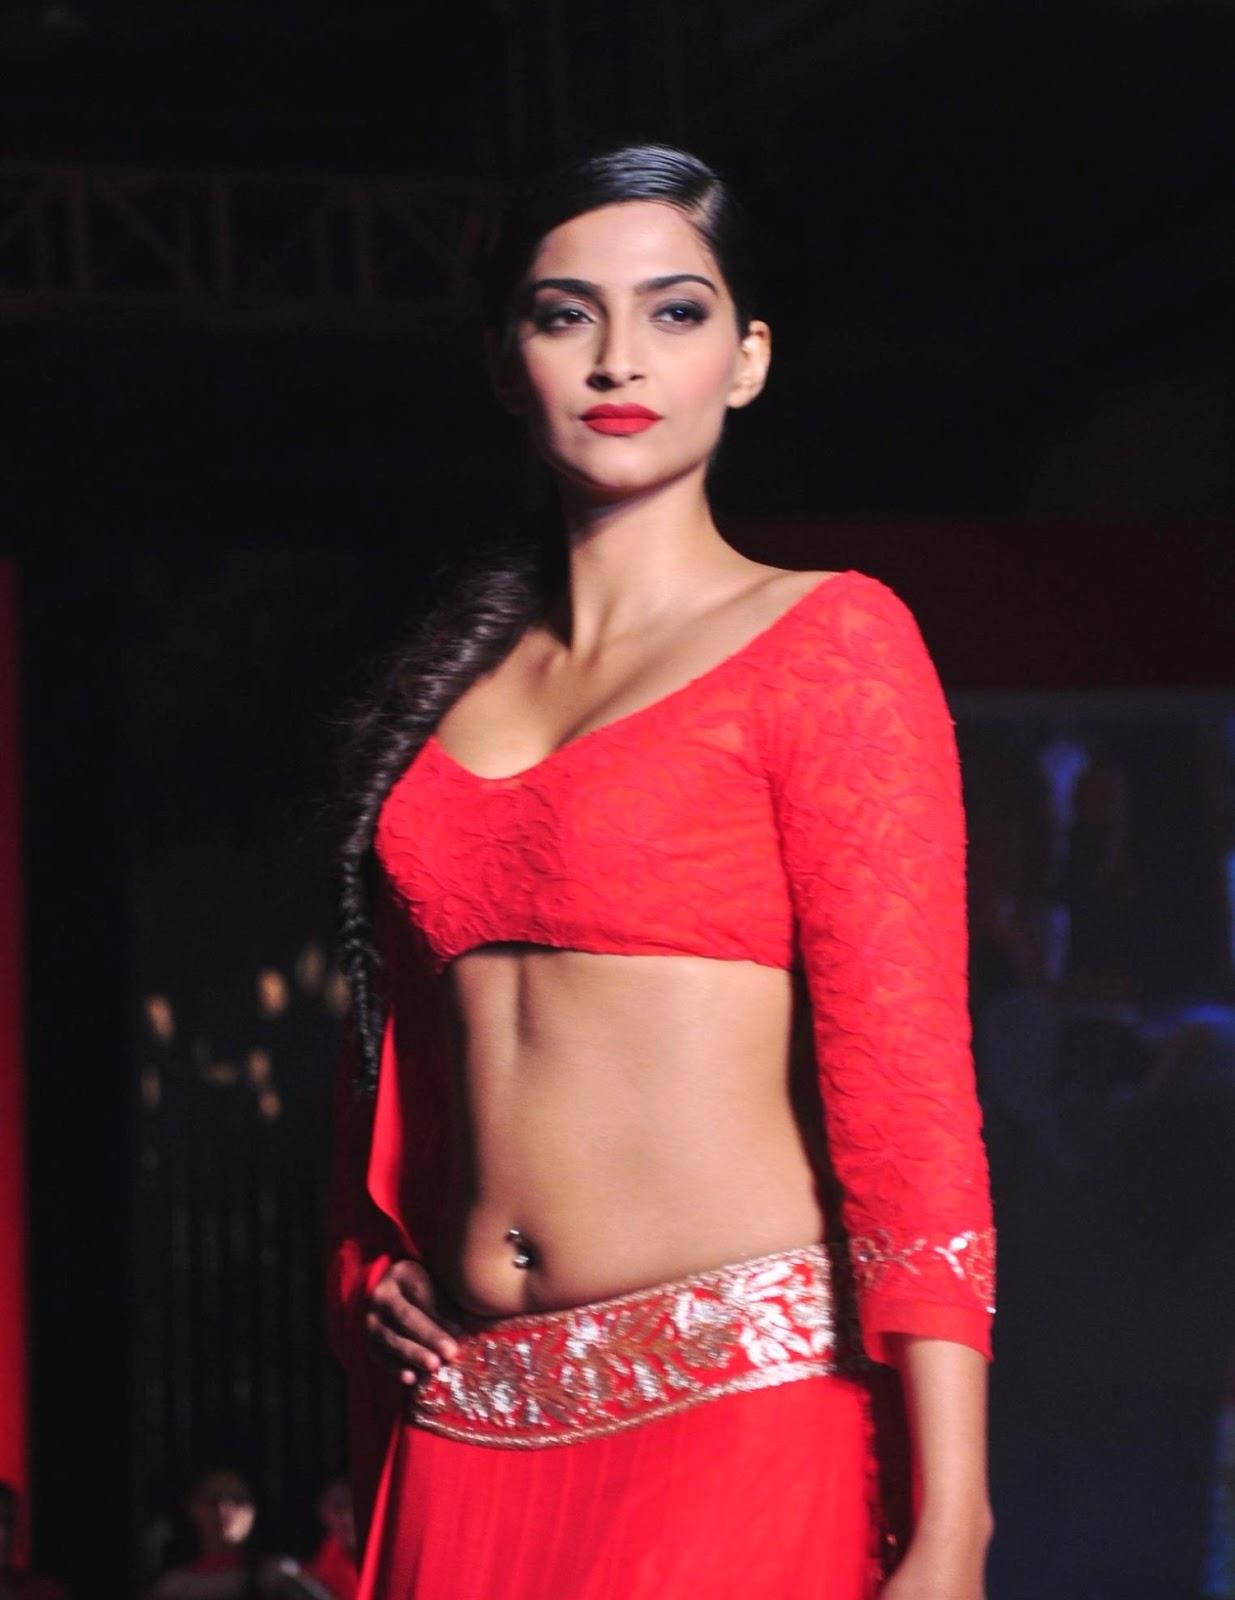 Sonam Kapoor Wallpapers: Sonam Kapoor Spicy HD Photos